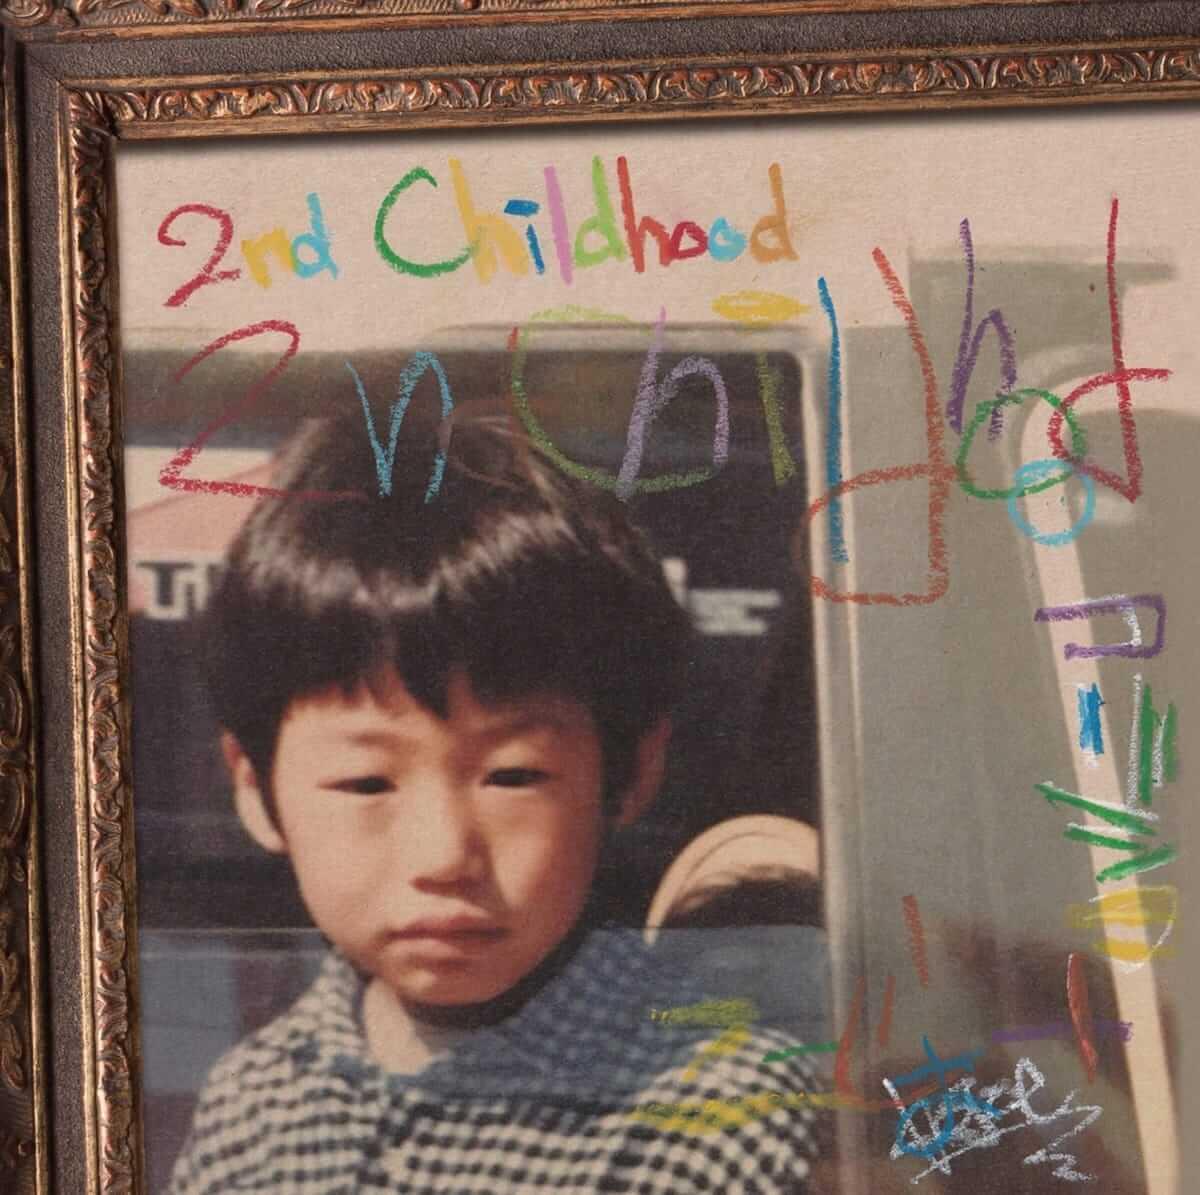 Kojoeの8月にリリースされる新作の詳細が明らかに|5lackやRUDEBWOY FACE、仙人掌、CHAKI ZULU、illmore、NARISKら参加 music180801-kojoe-2-1200x1195